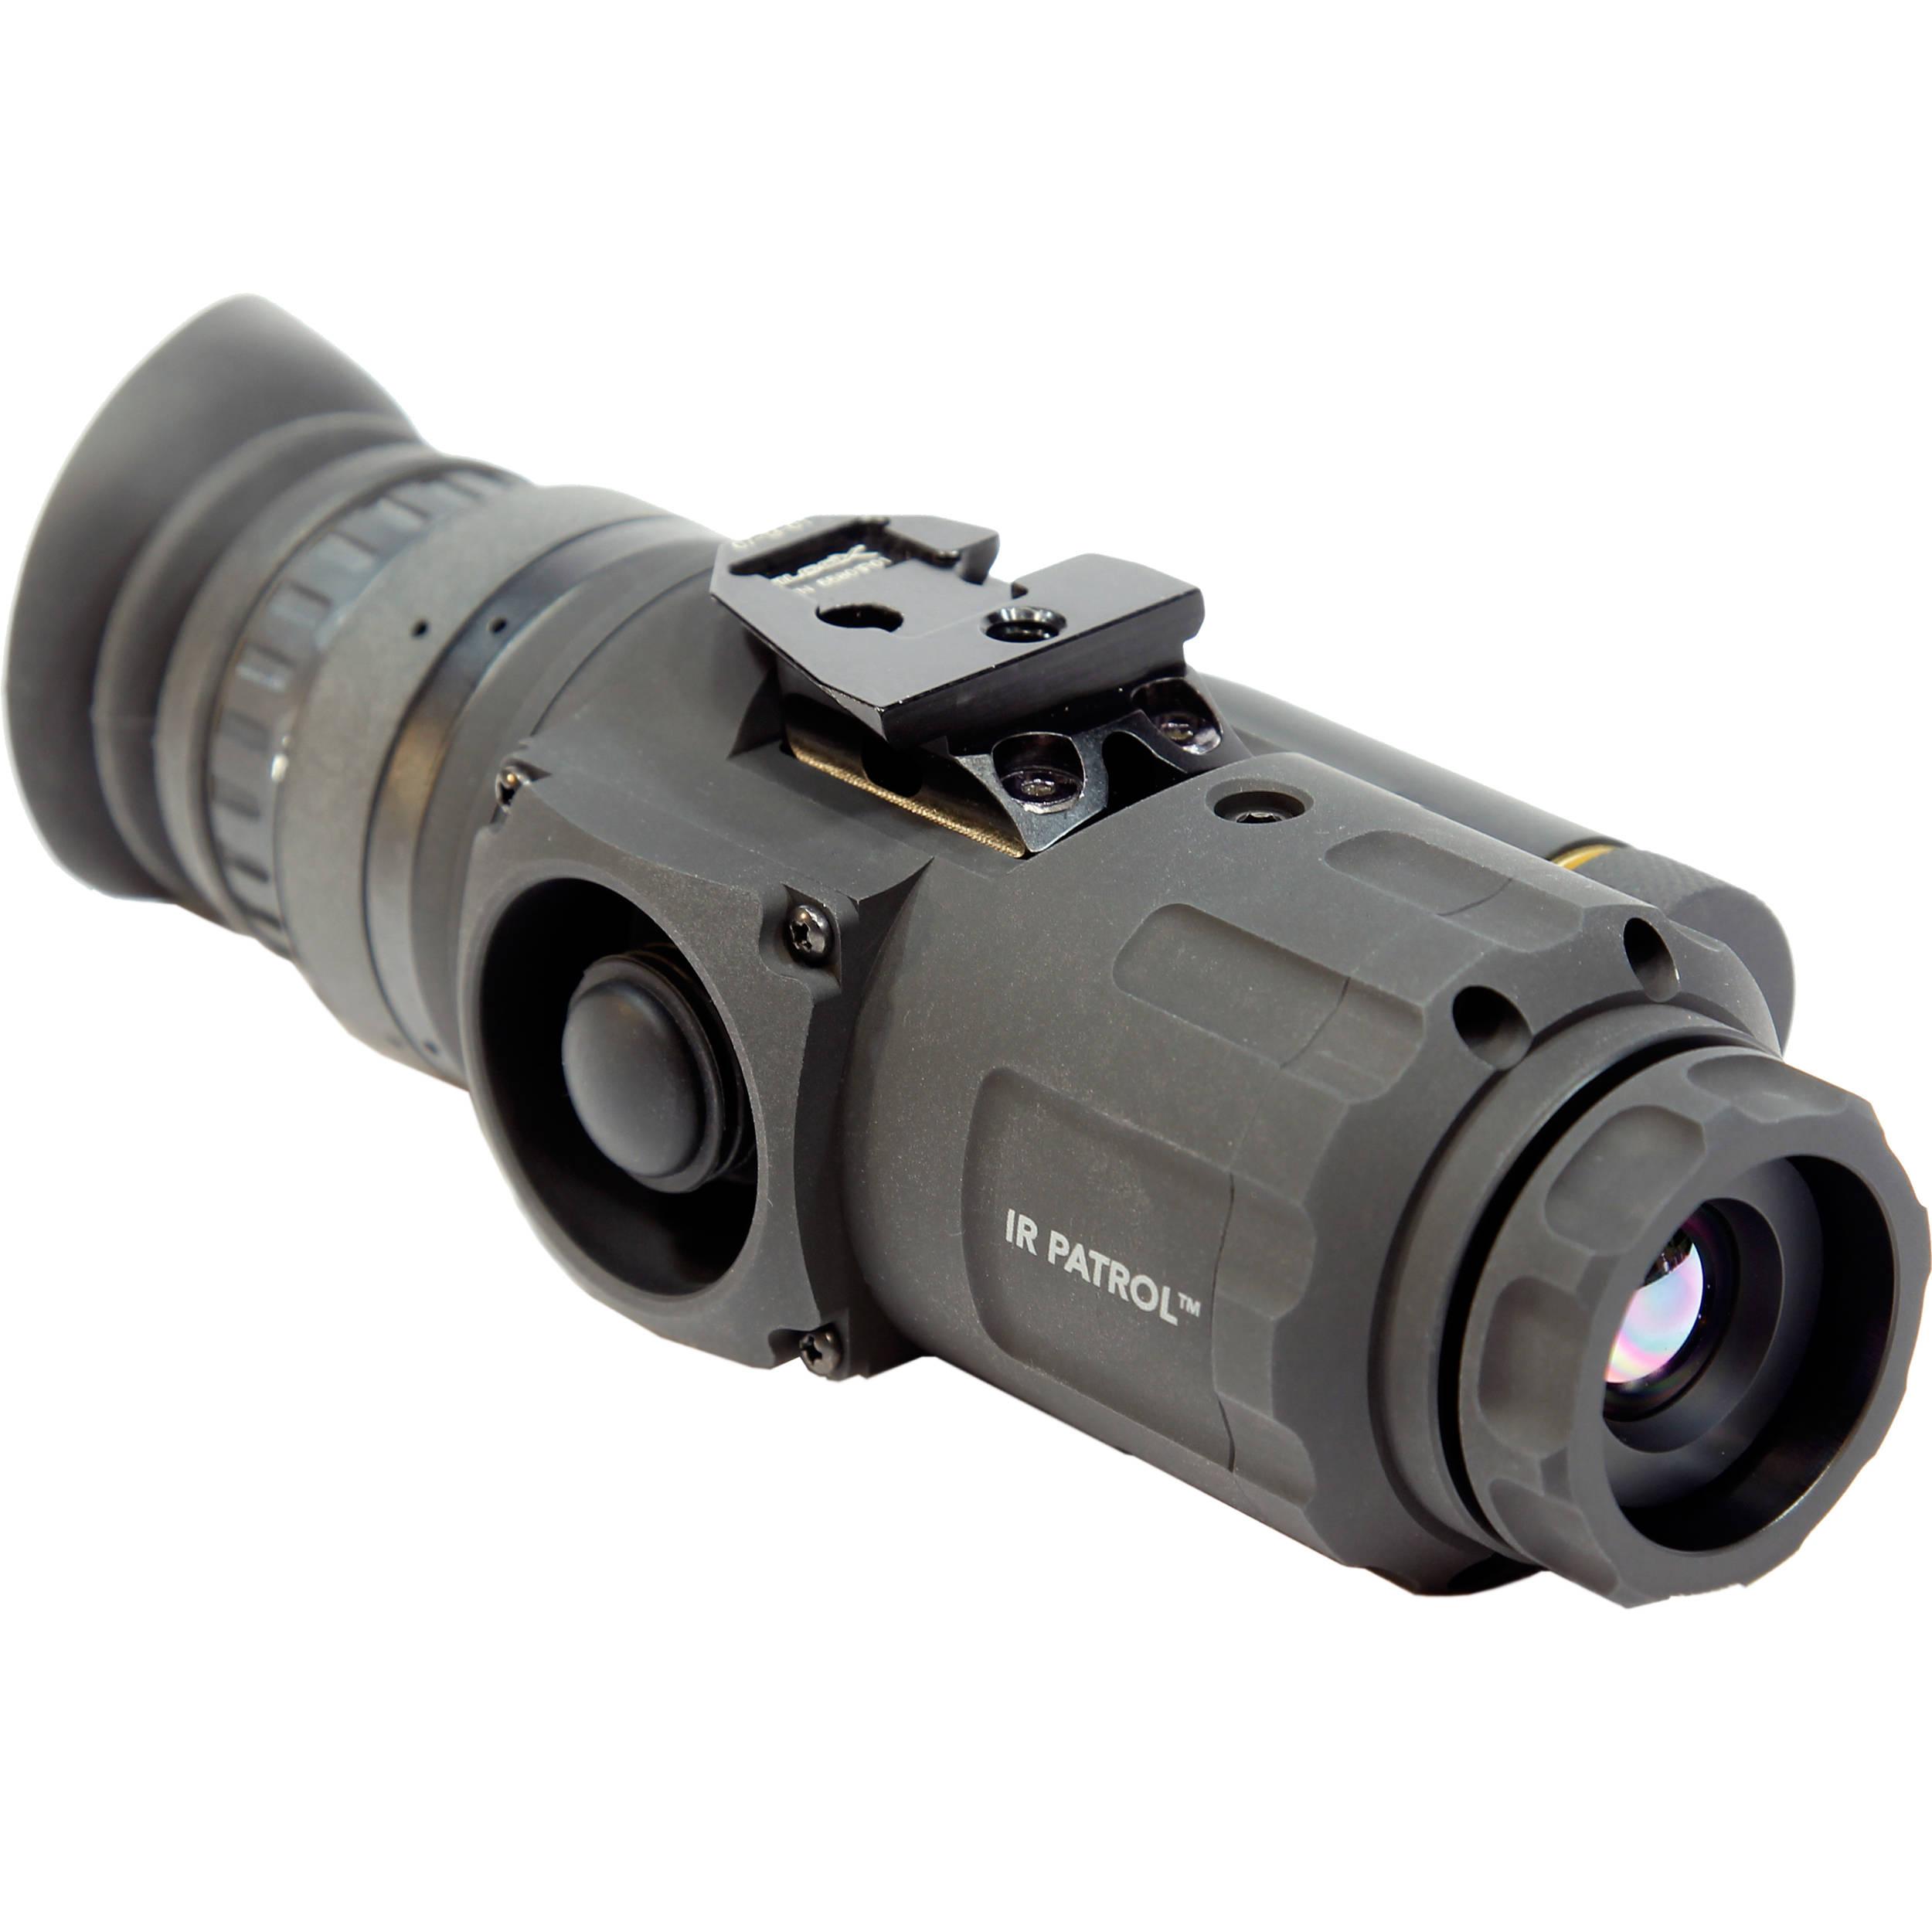 IR DEFENSE IR Patrol M250-K 1-8x Thermal Monocular Kit (60-30 Hz)